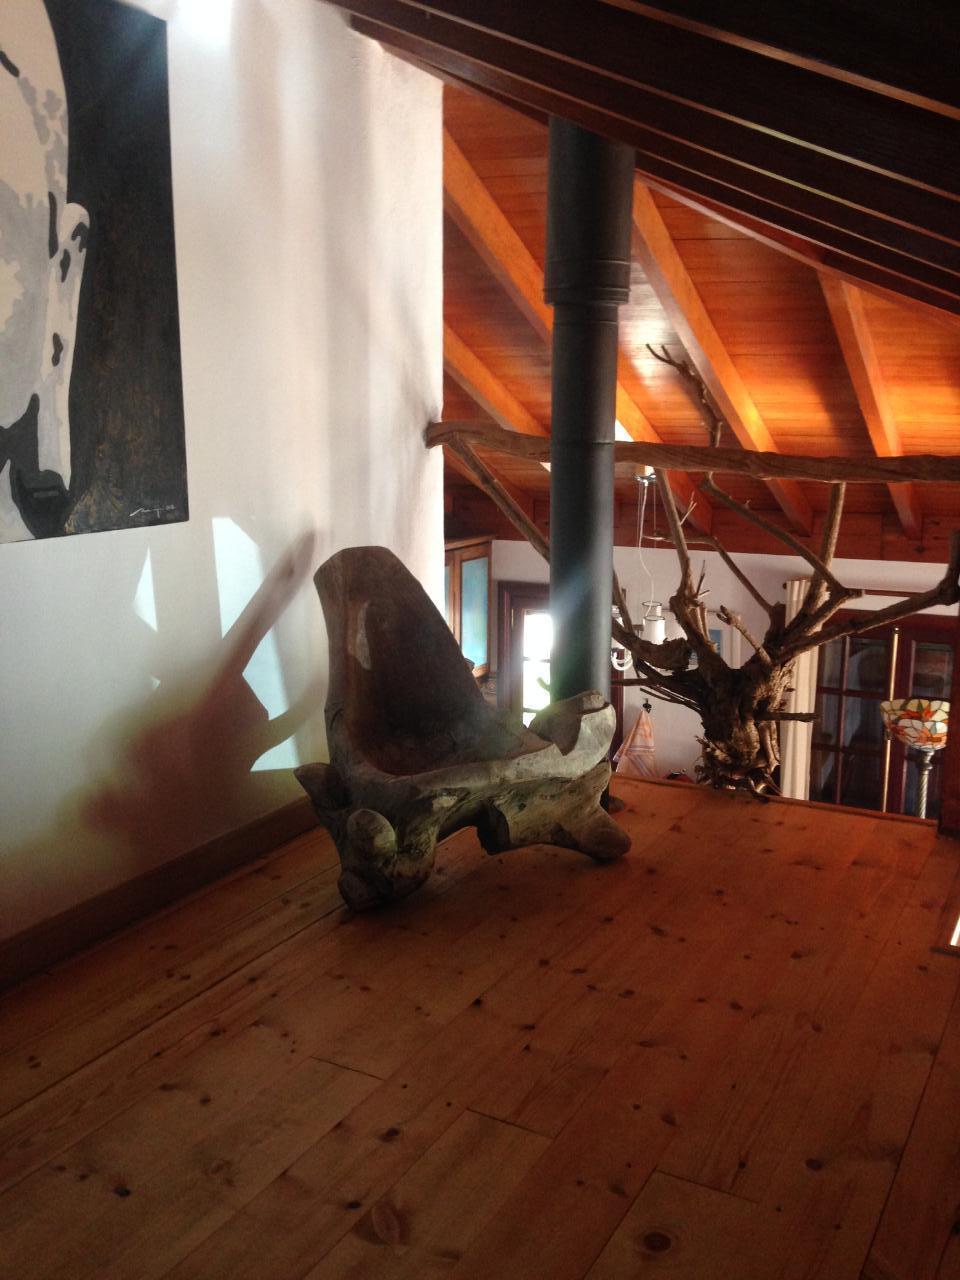 Maison de vacances Casita auf luxuriöser Finca in idyllischer Lage, Whirlpool, Atlantik- und Teidepanorama (2397261), Tacoronte, Ténérife, Iles Canaries, Espagne, image 15